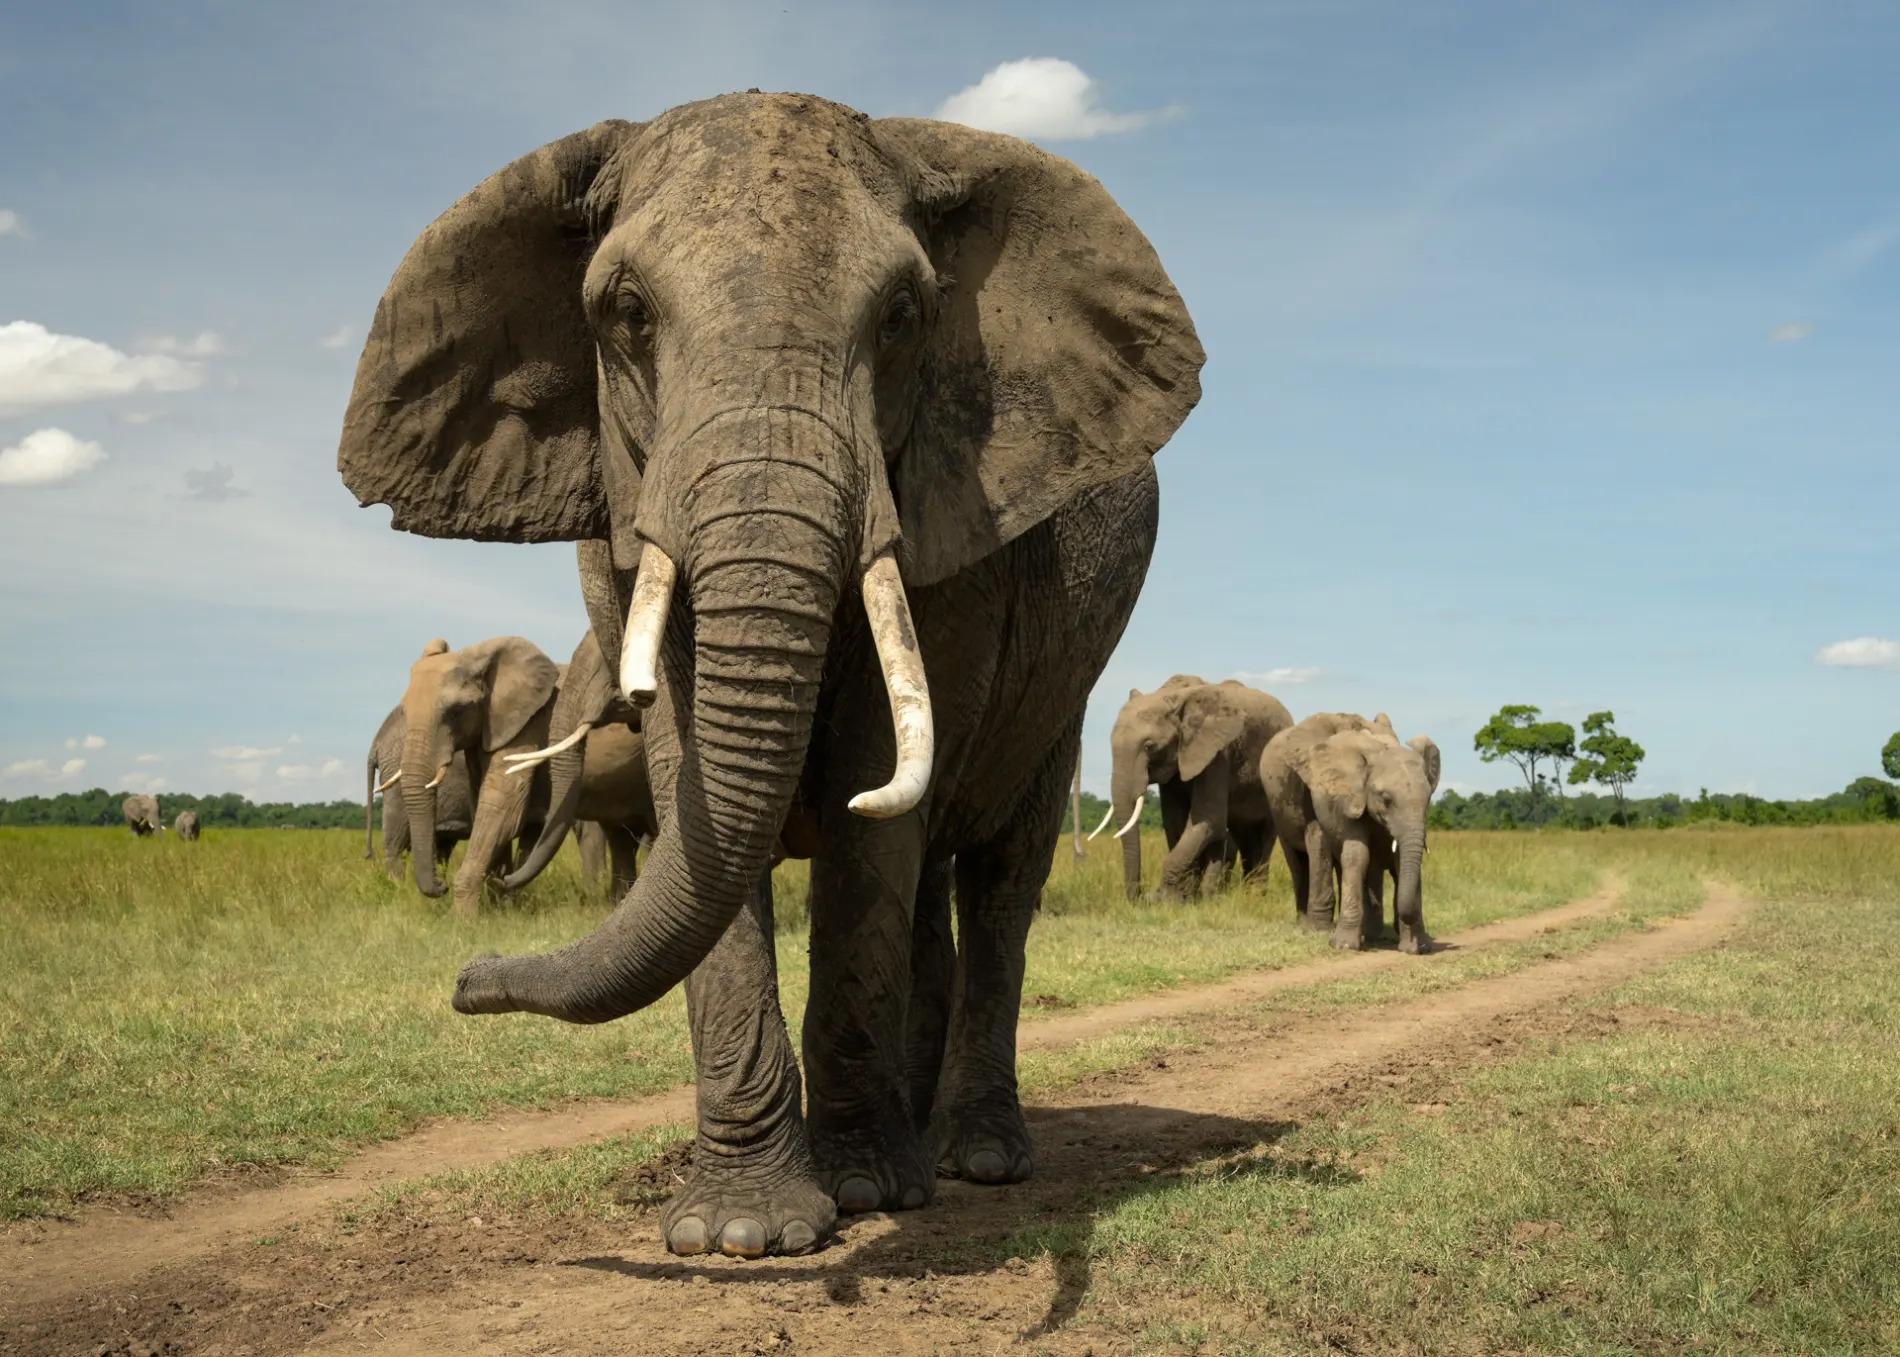 Elephant straight on